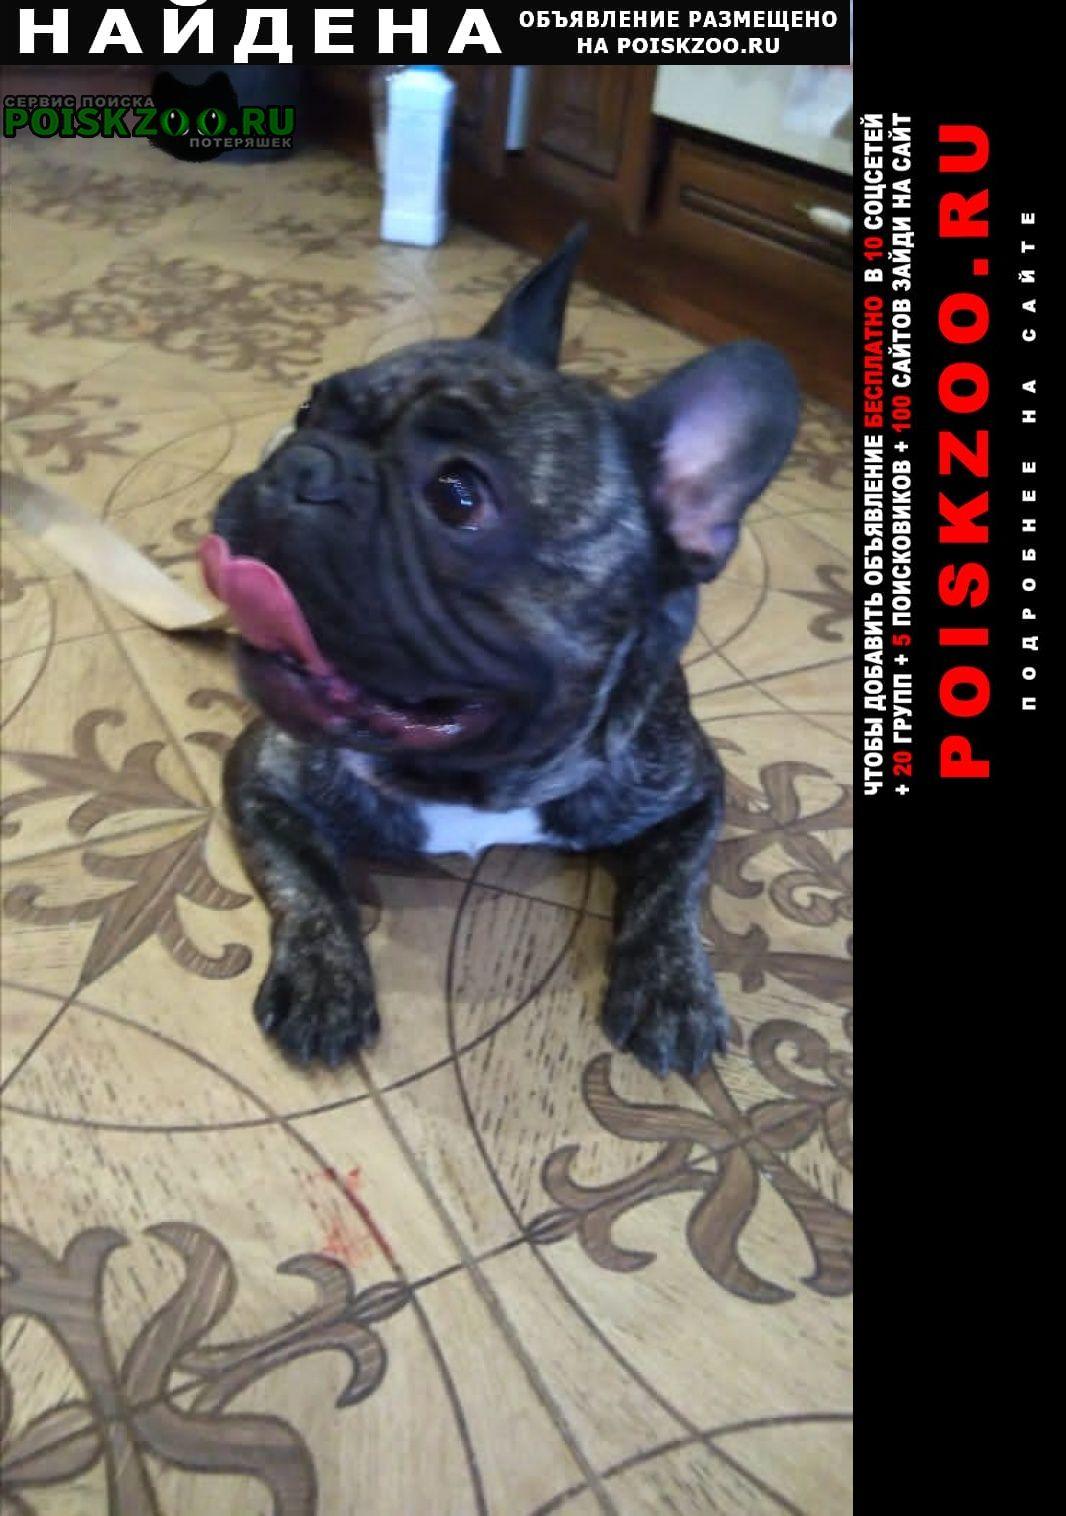 Найдена собака кобель французский будьдог Владимир